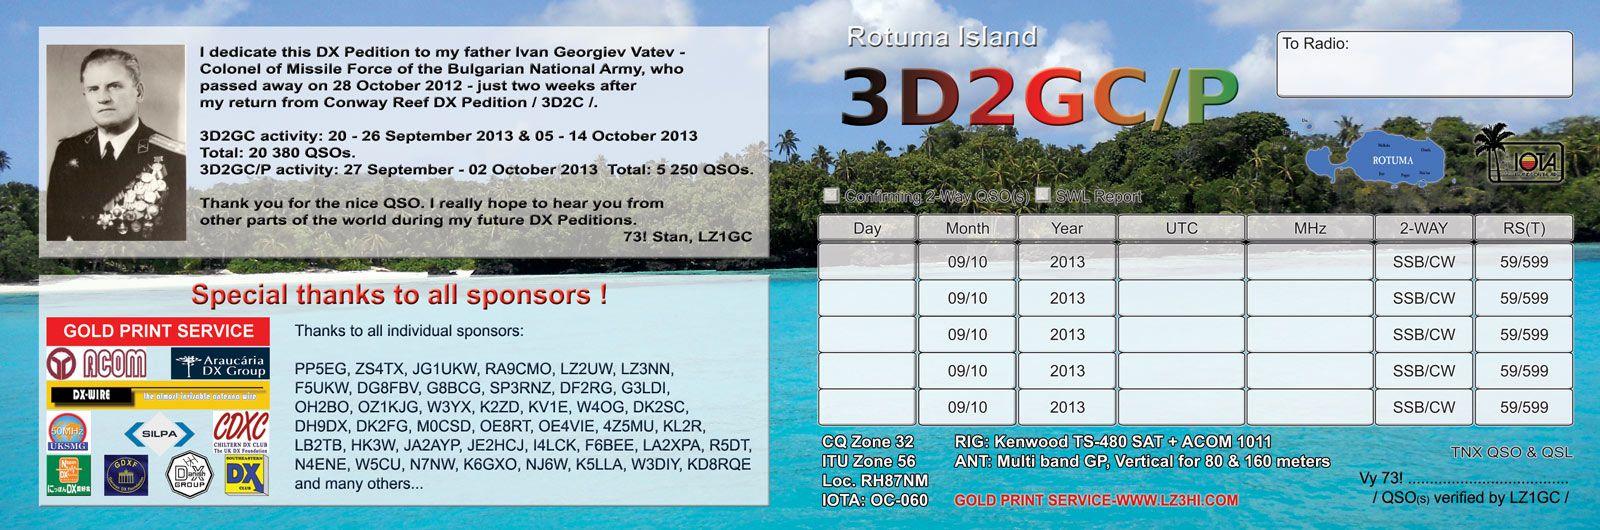 Остров Ротума 3D2GC/P QSL